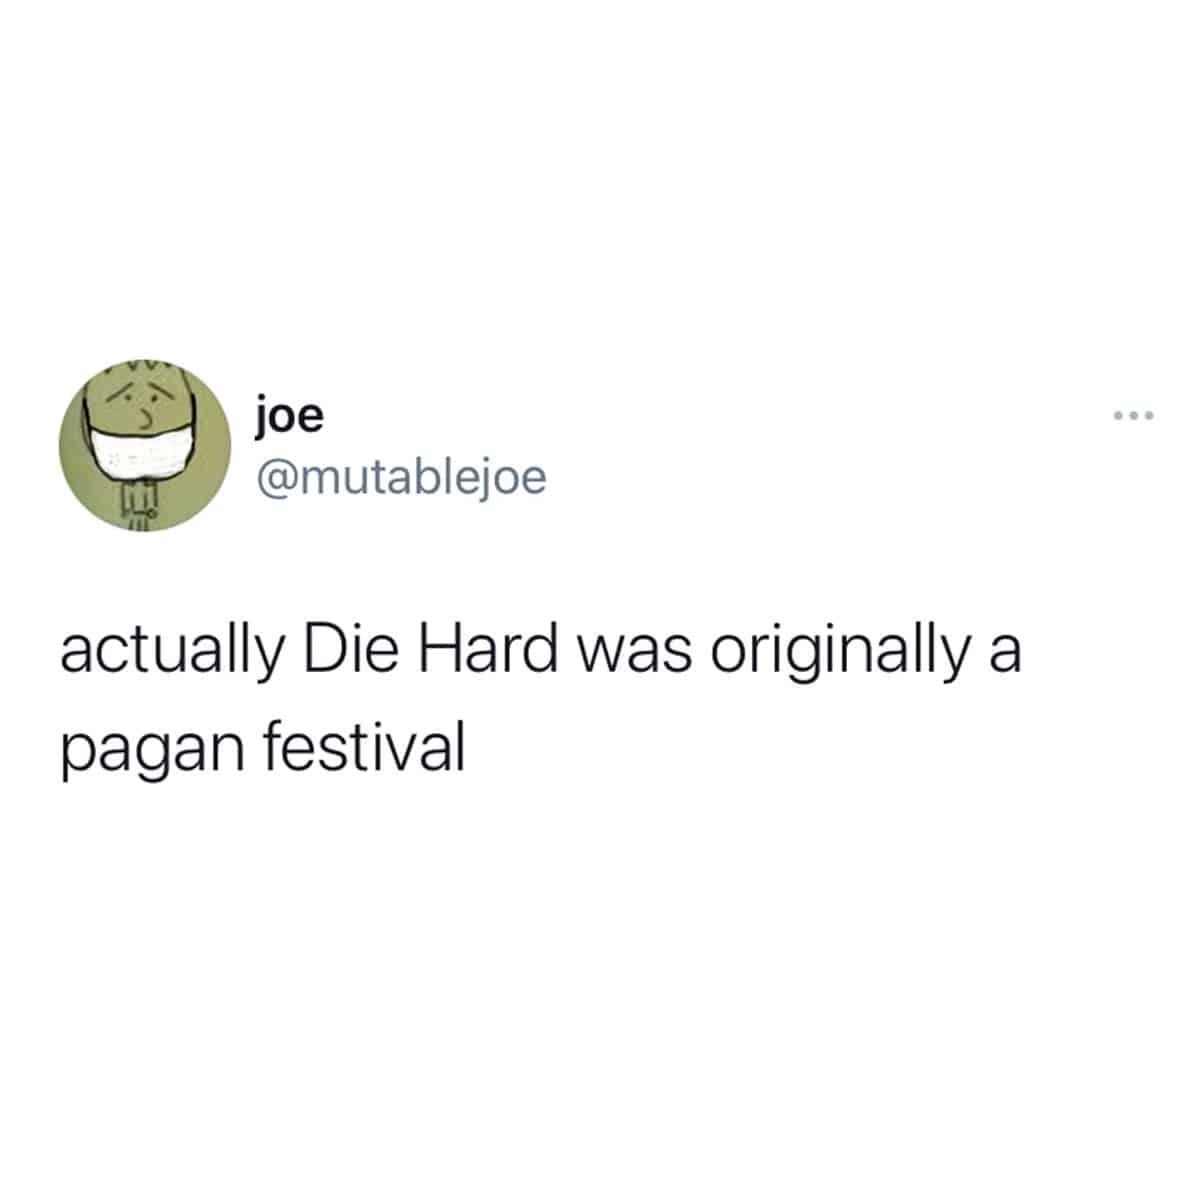 die hard pagan festival